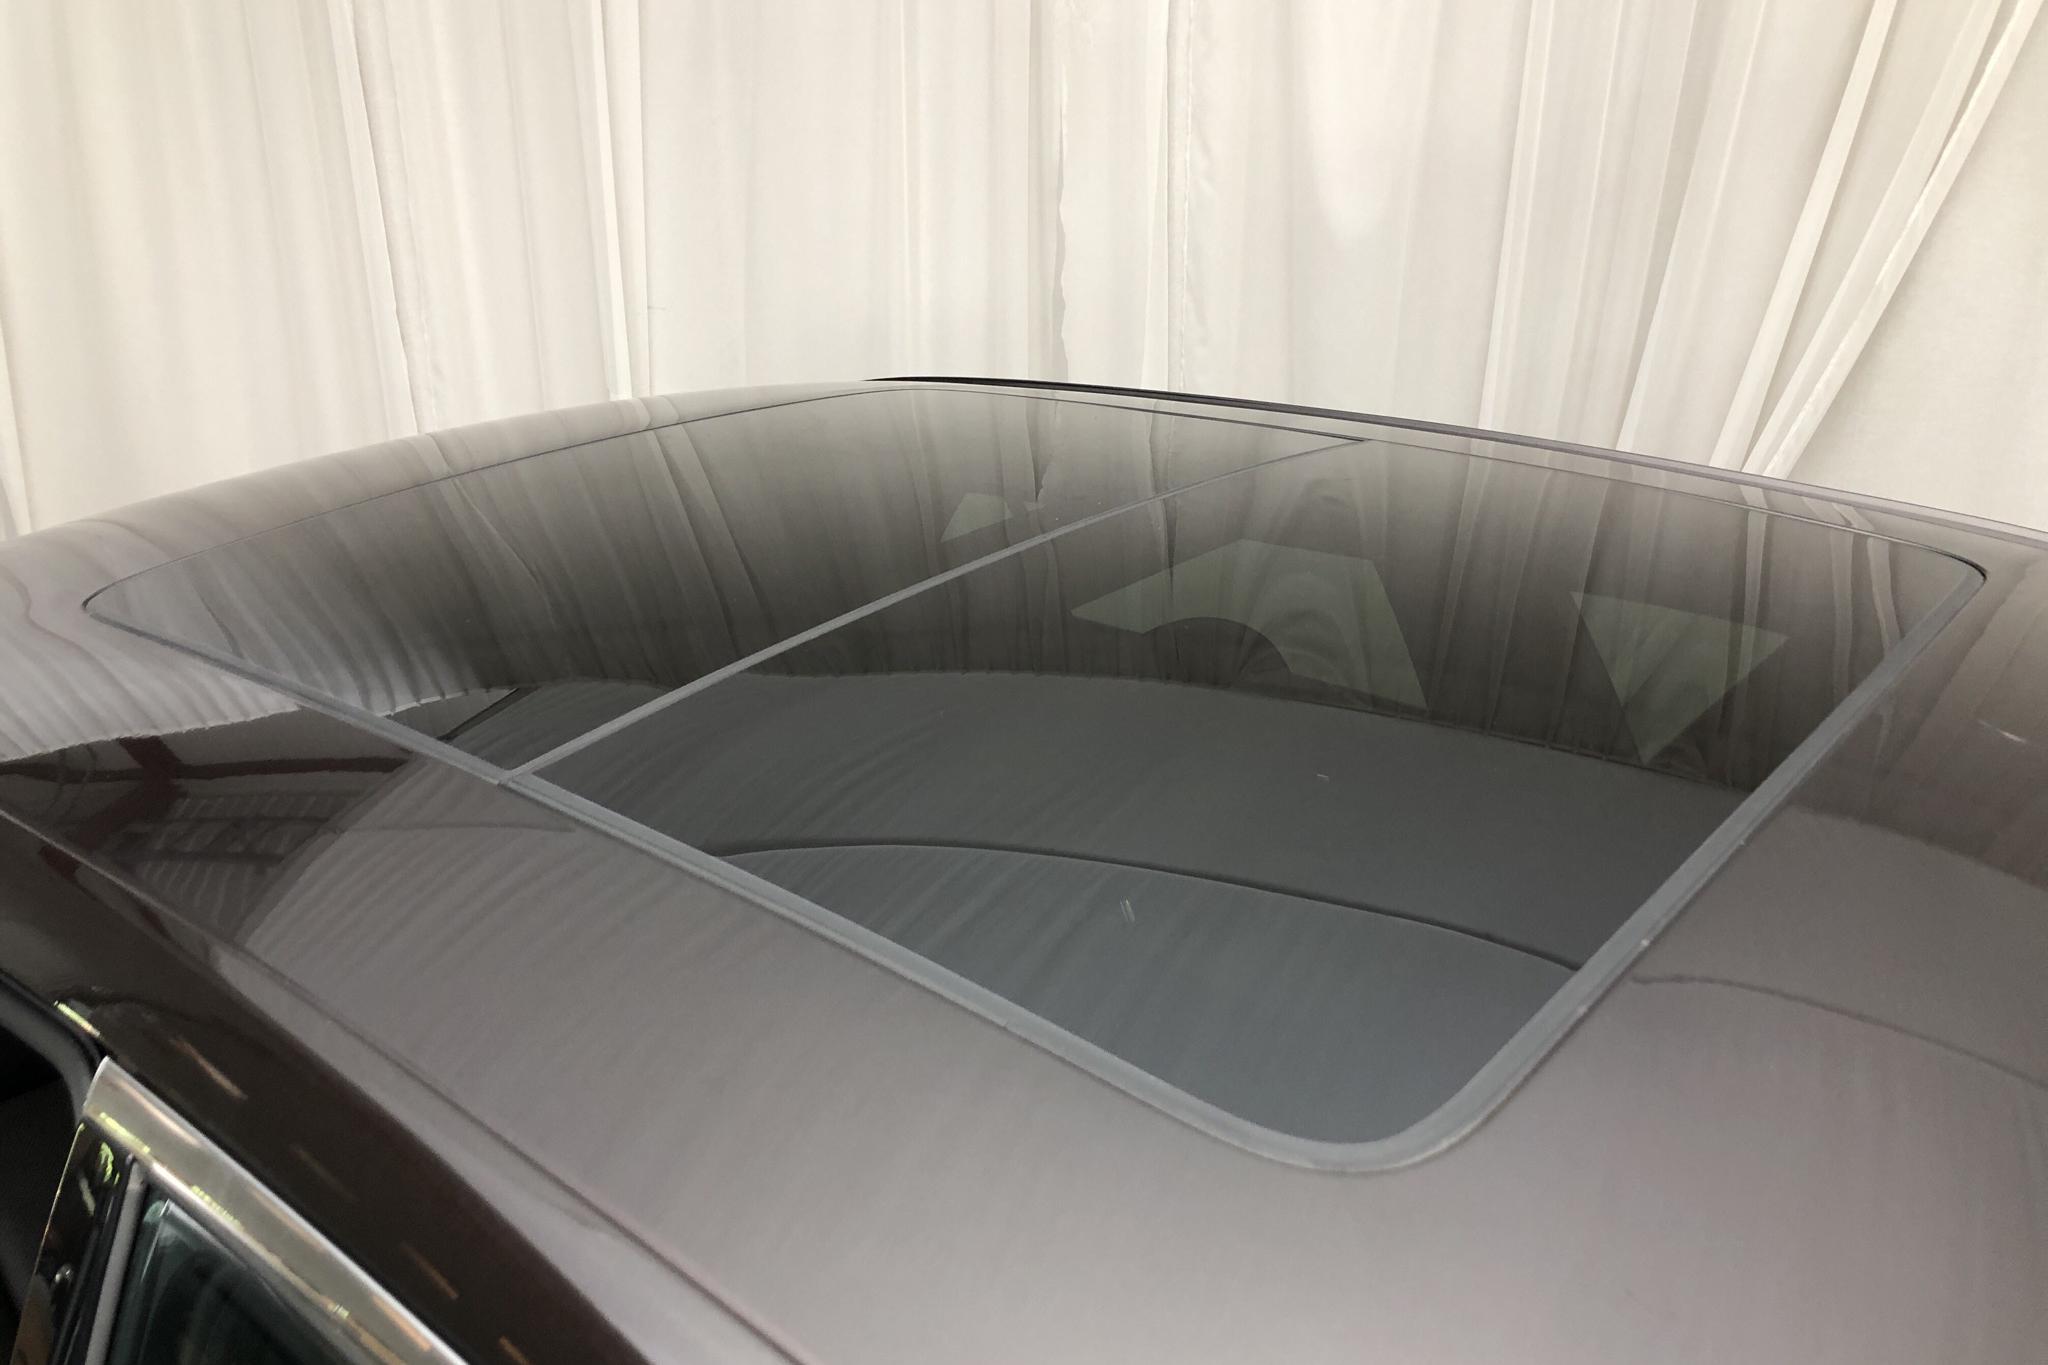 Lancia Thema 3.0 V6 (190hk) - 13 420 mil - Automat - Dark Brown - 2012